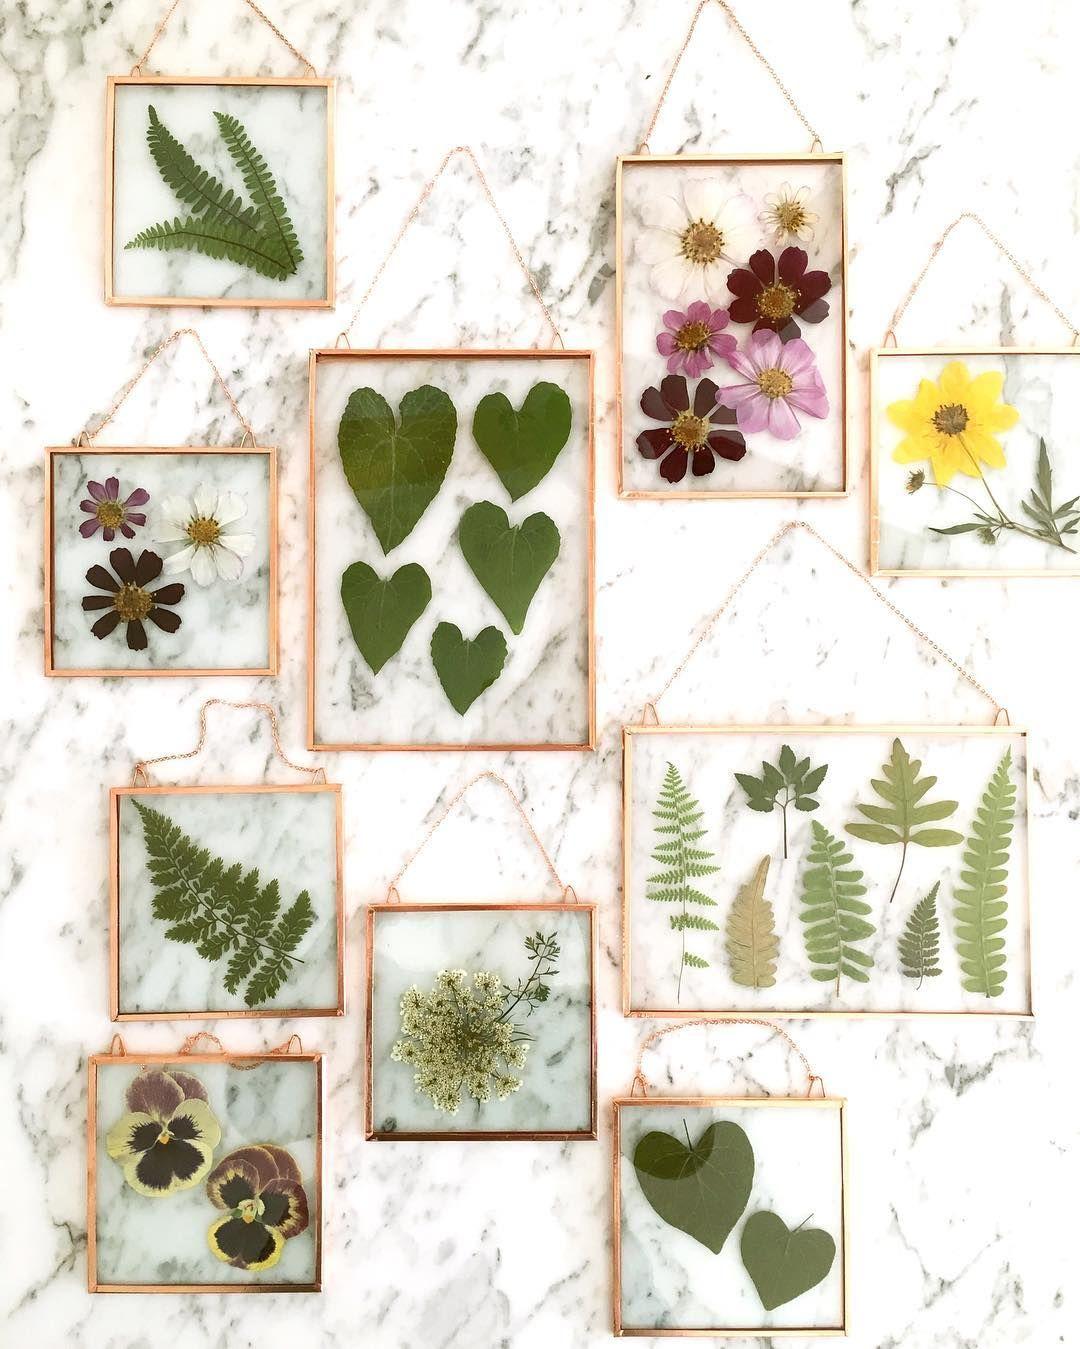 Atemberaubende gepresste Blumenkunst von Karly Murphy Die in Virginia lebende Künstlerin Karly Murphy p …